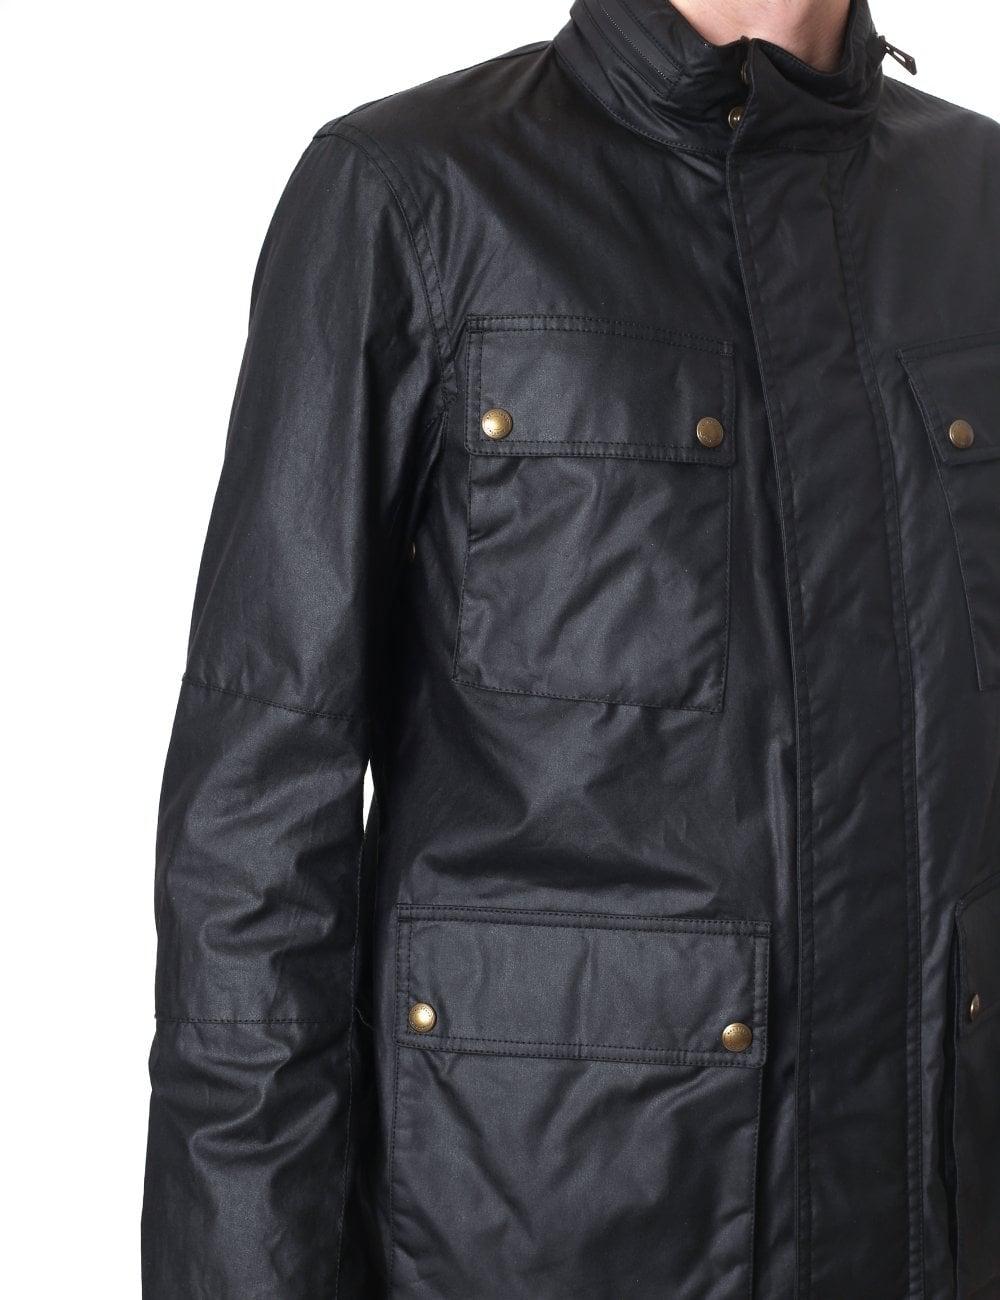 edf561dbdf Belstaff Men s Explorer Jacket